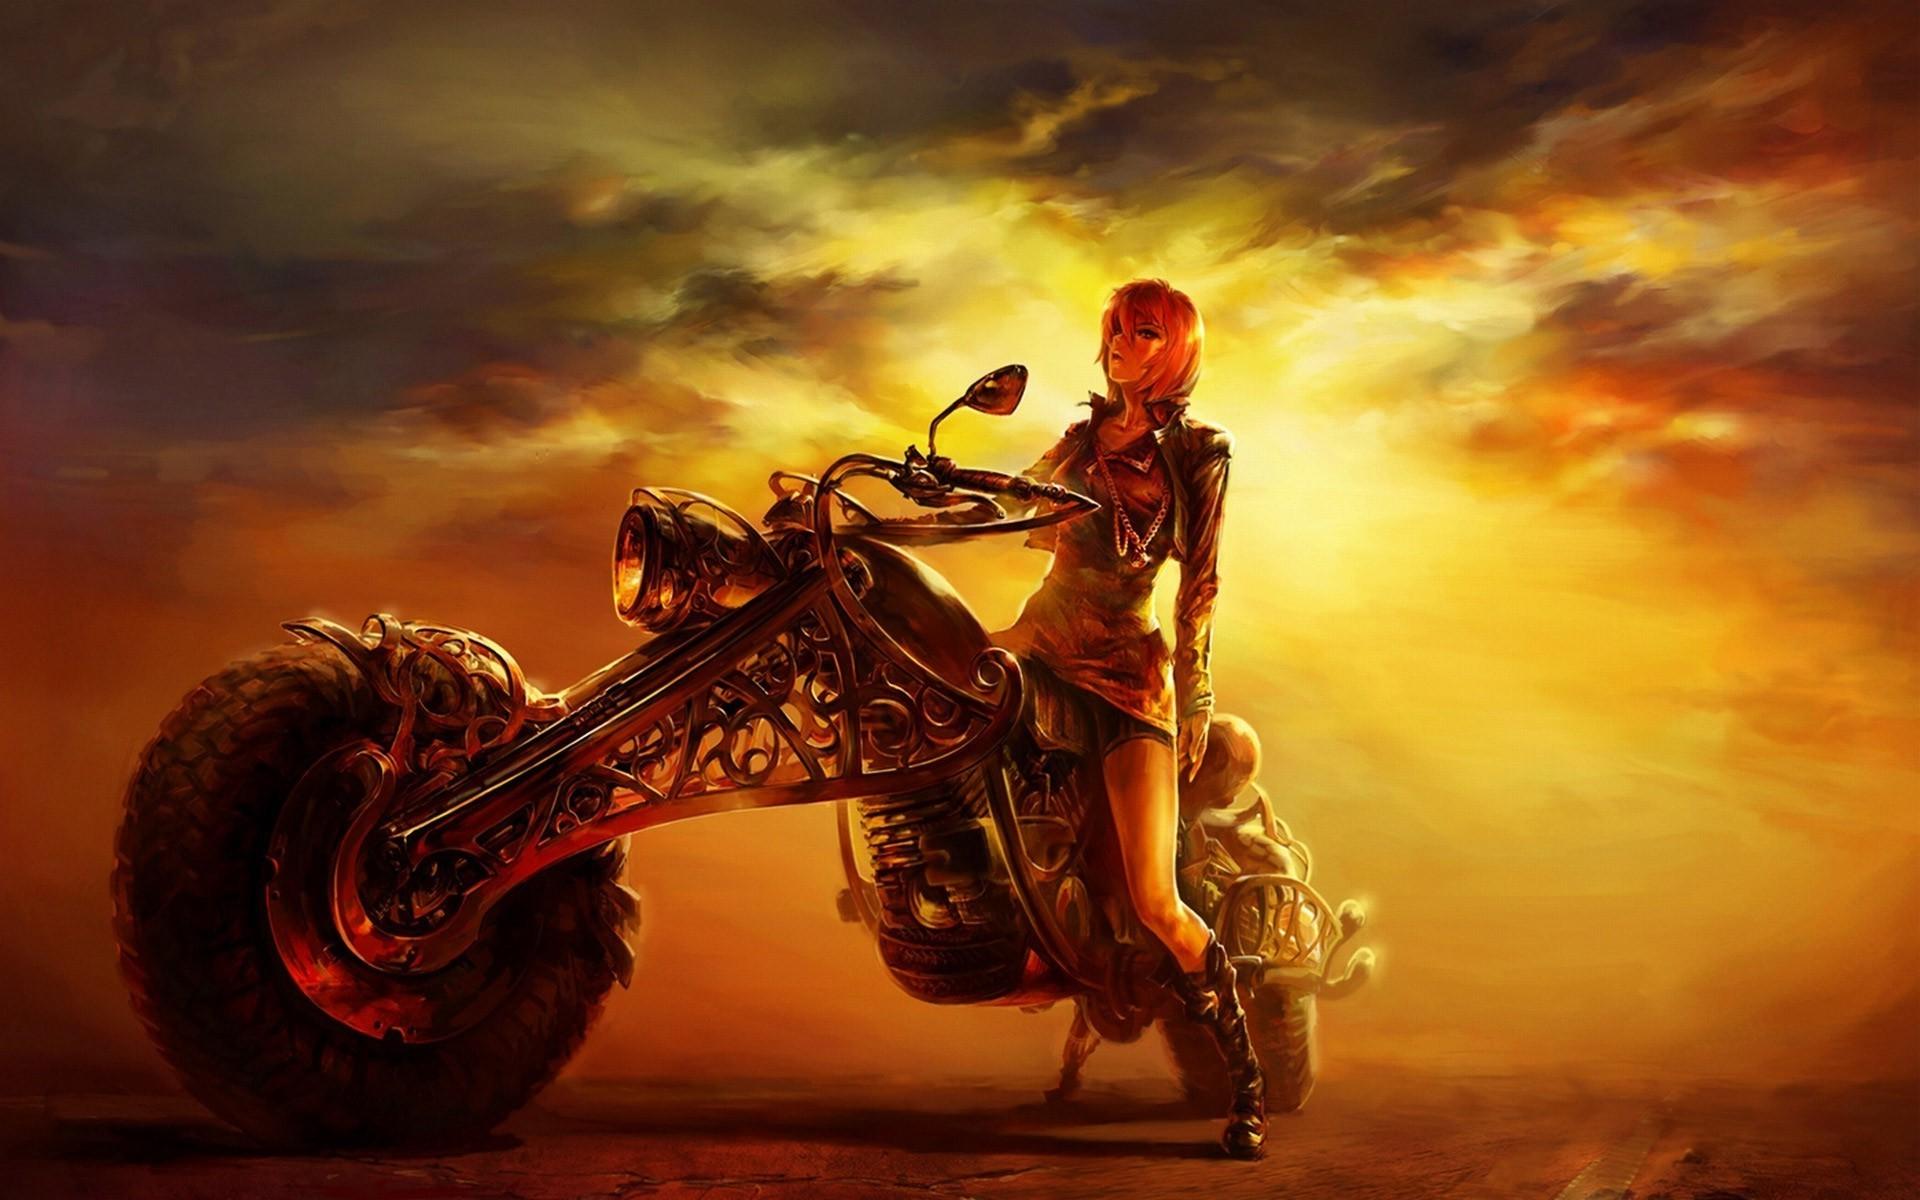 Bikes & Girls wallpapers | Motorcycle Girl | Pinterest | Girl wallpaper and  Biker chick